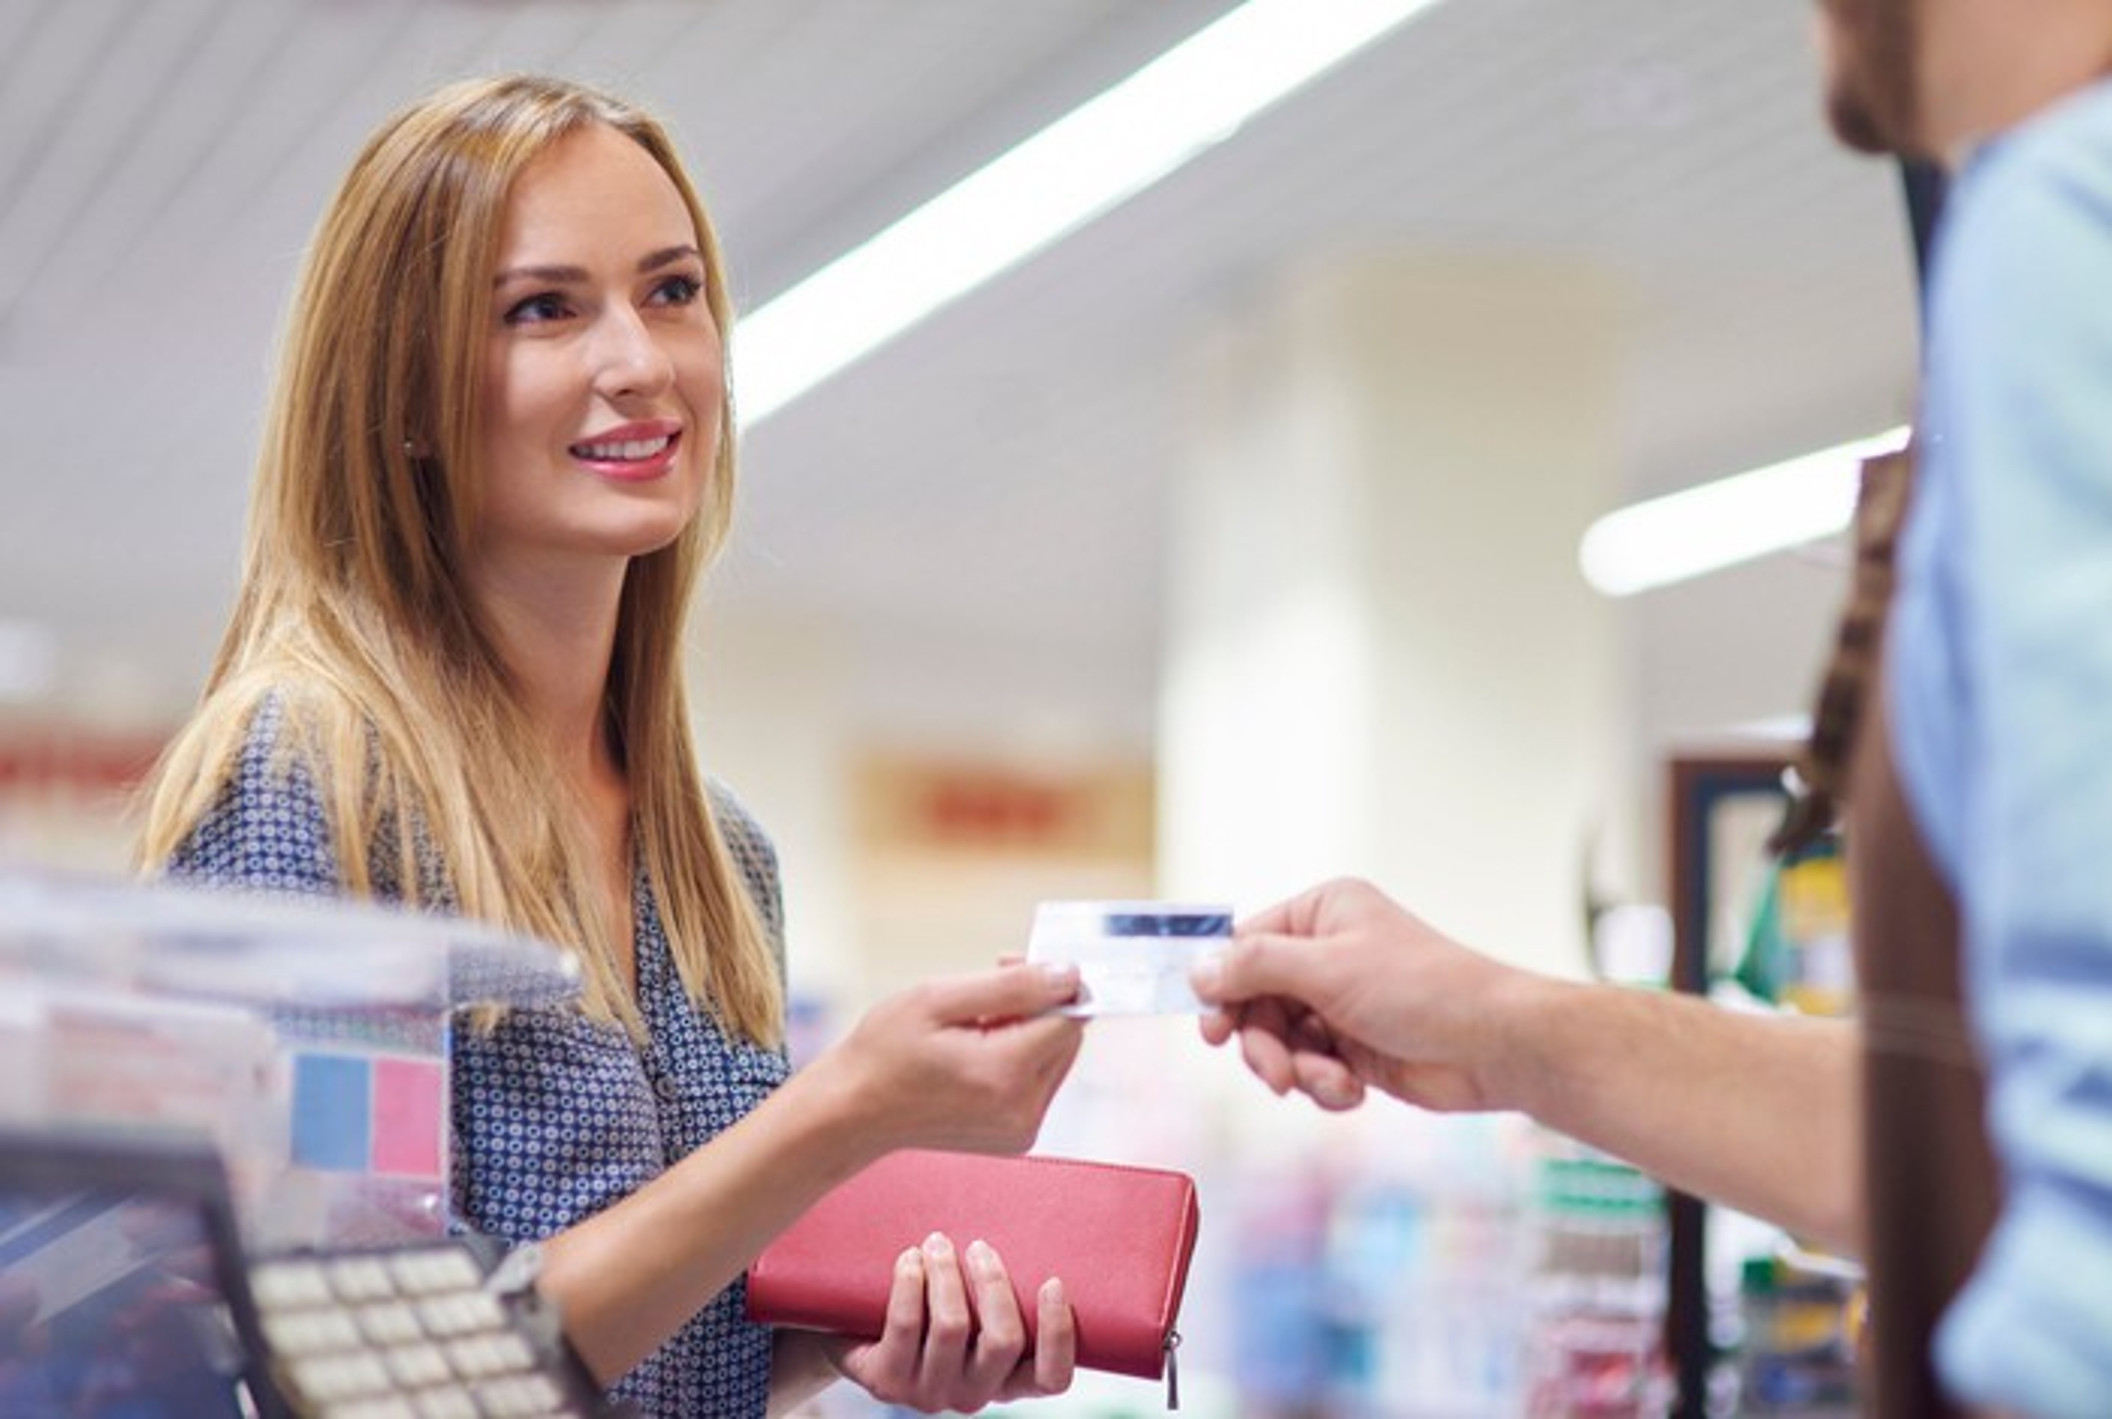 A woman checks out at a retail store.